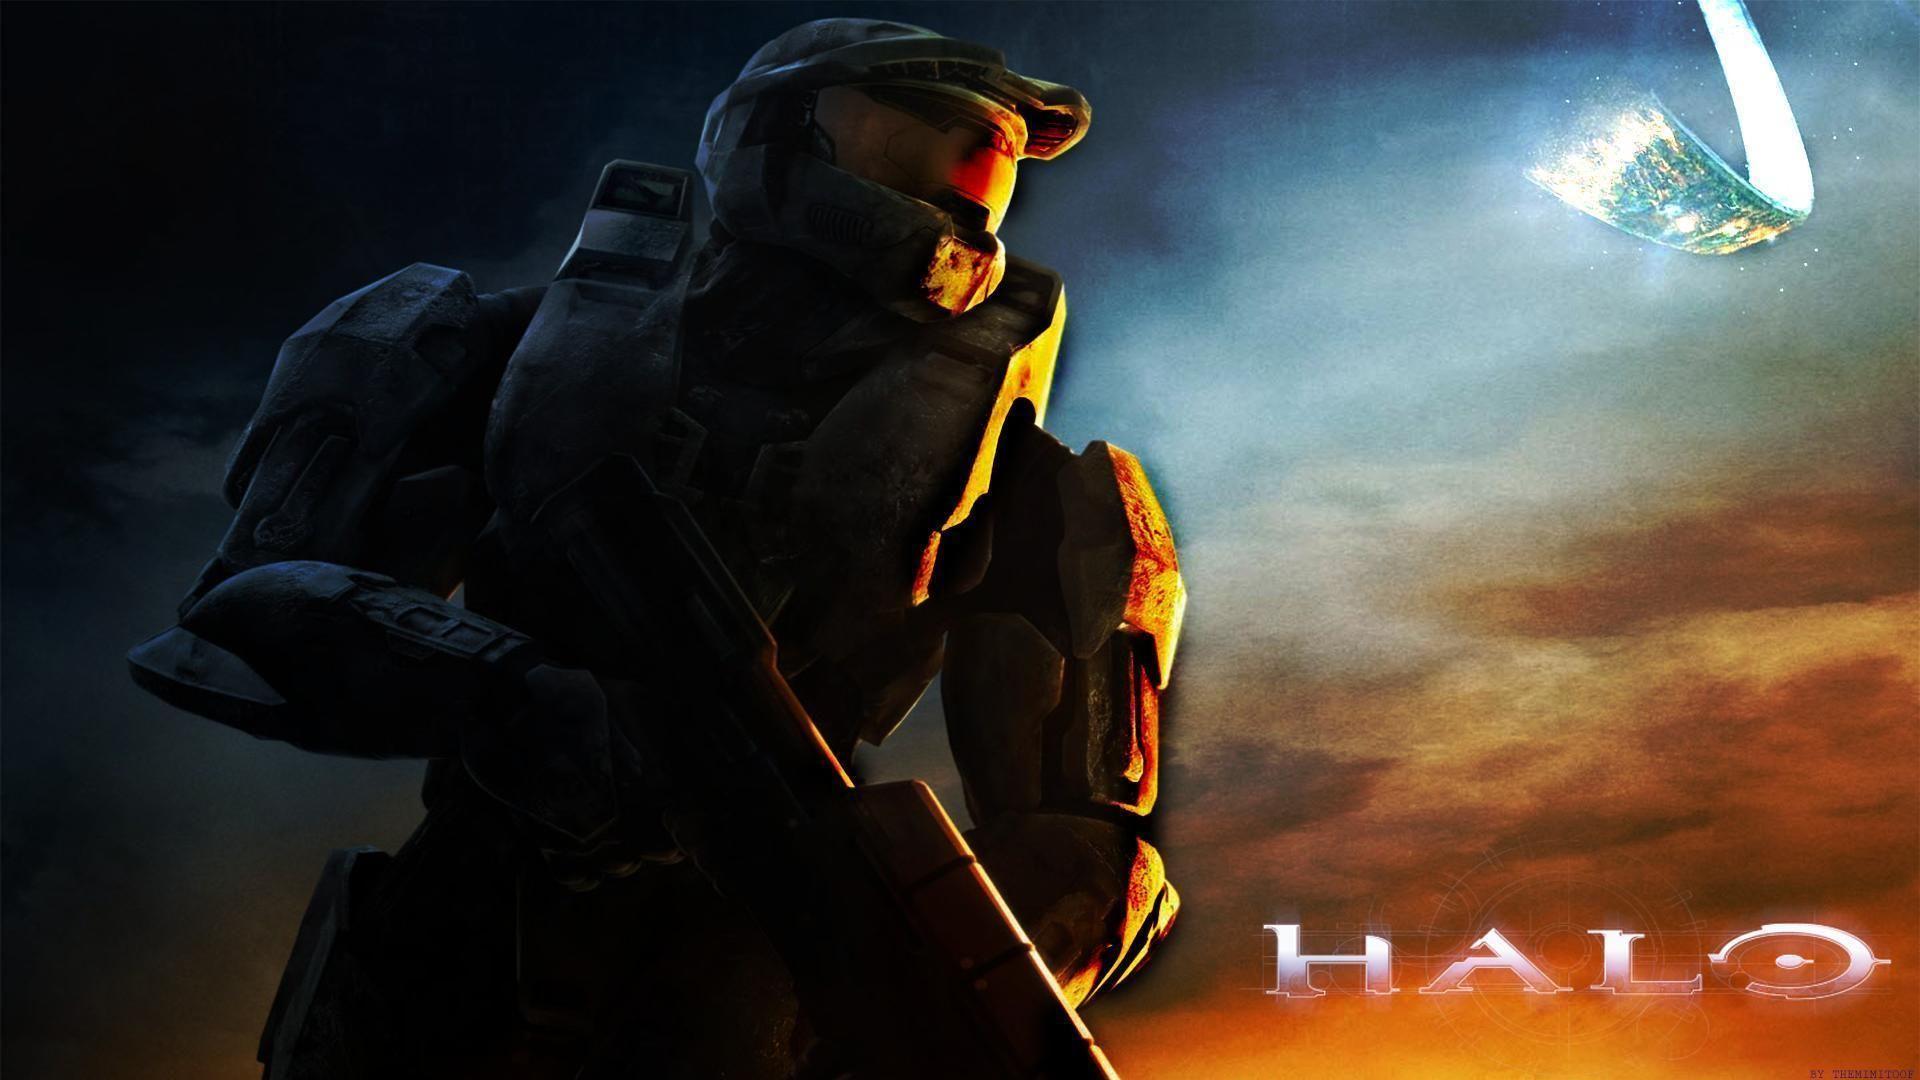 Free Download Halo Wallpapers For Desktop, Mobile Tablet